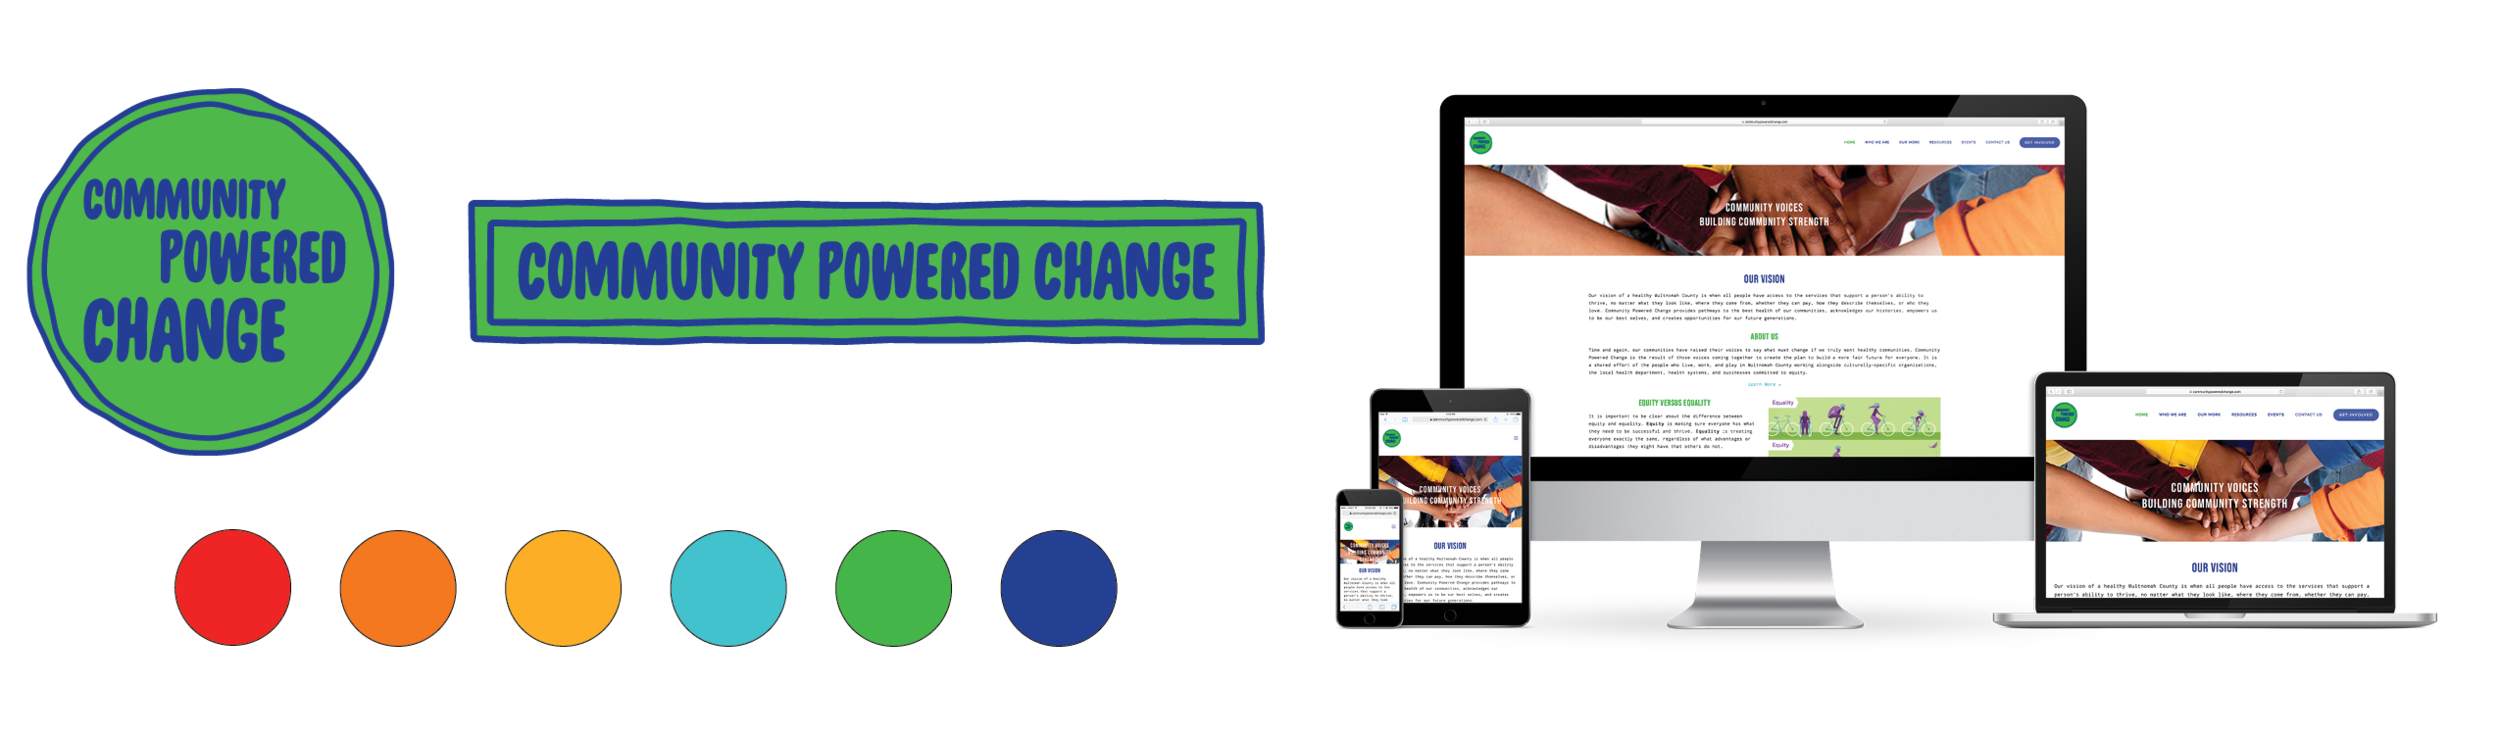 Community Powered Change branding + website